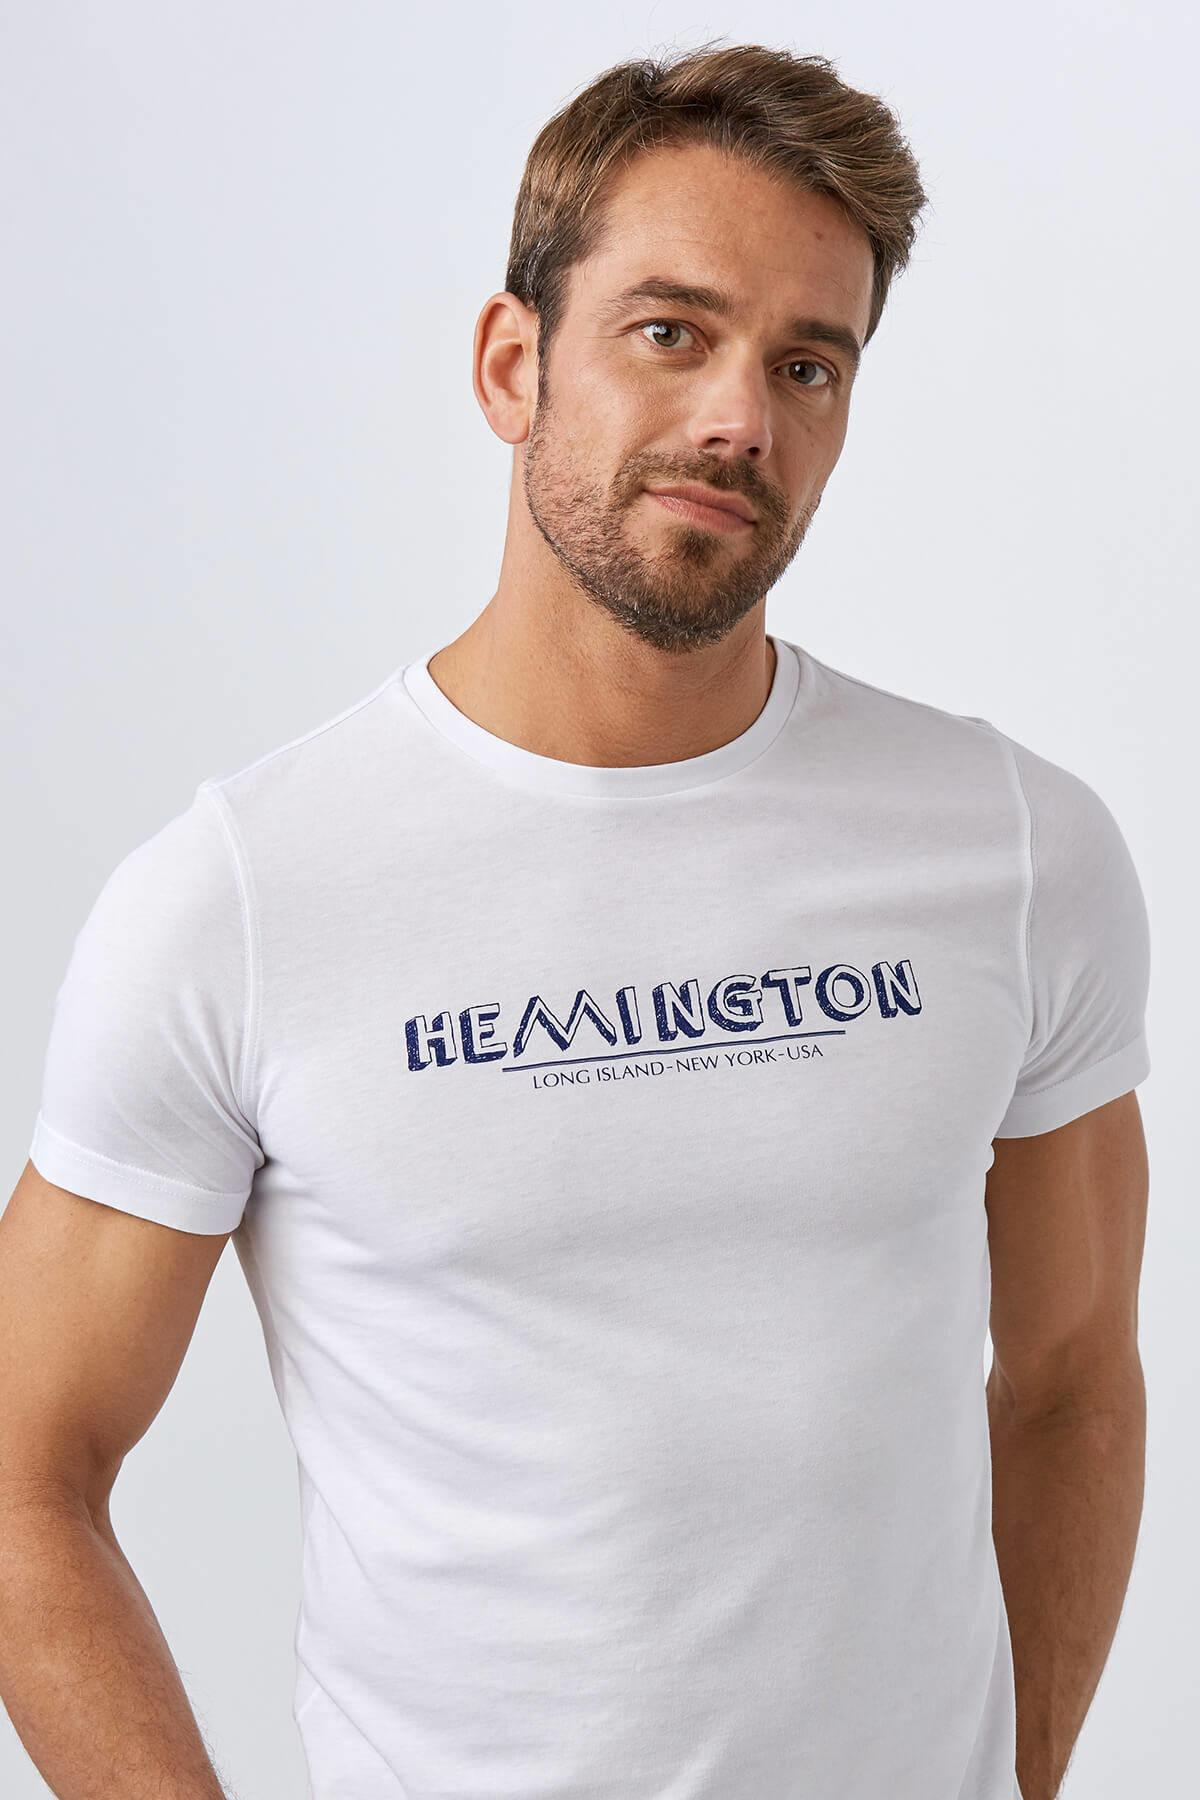 Beyaz Baskılı Bisiklet Yaka T-Shirt